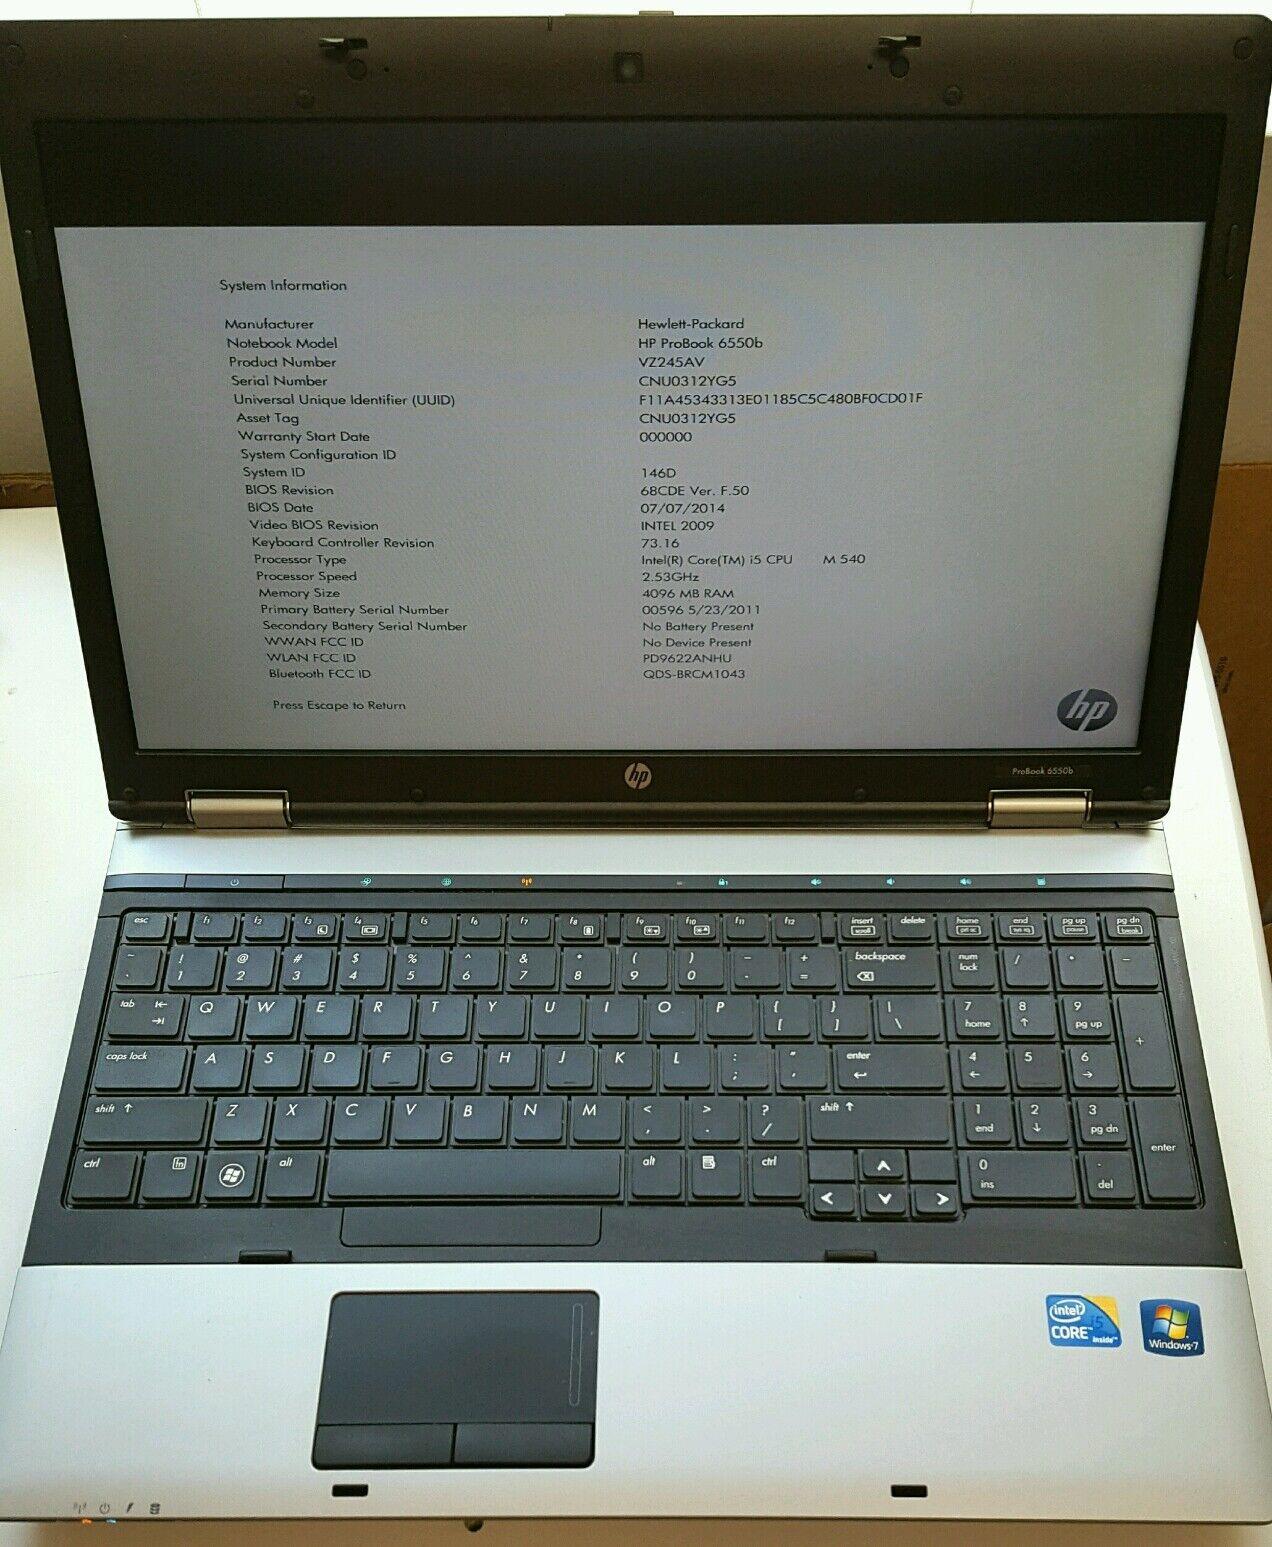 HP PROBOOK 6550B CORE i5 - 2.53GHz 4GB 15.6